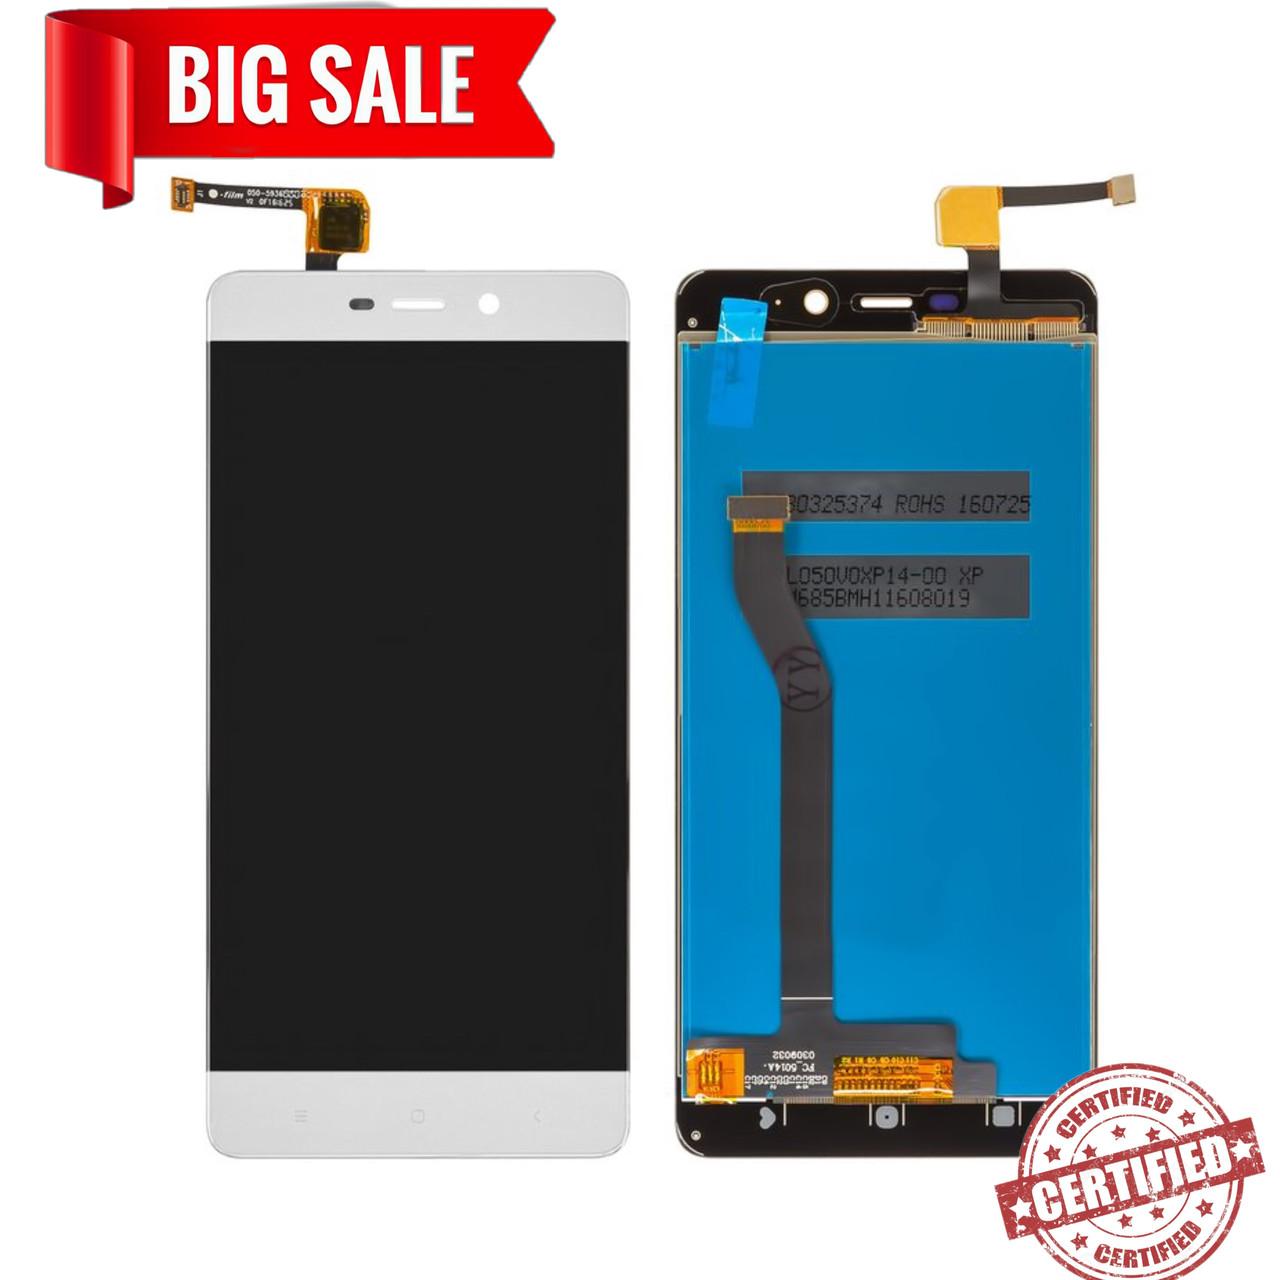 Модуль (дисплей+сенсор) для Xiaomi Redmi 4 PRO, Redmi 4 Prime білий